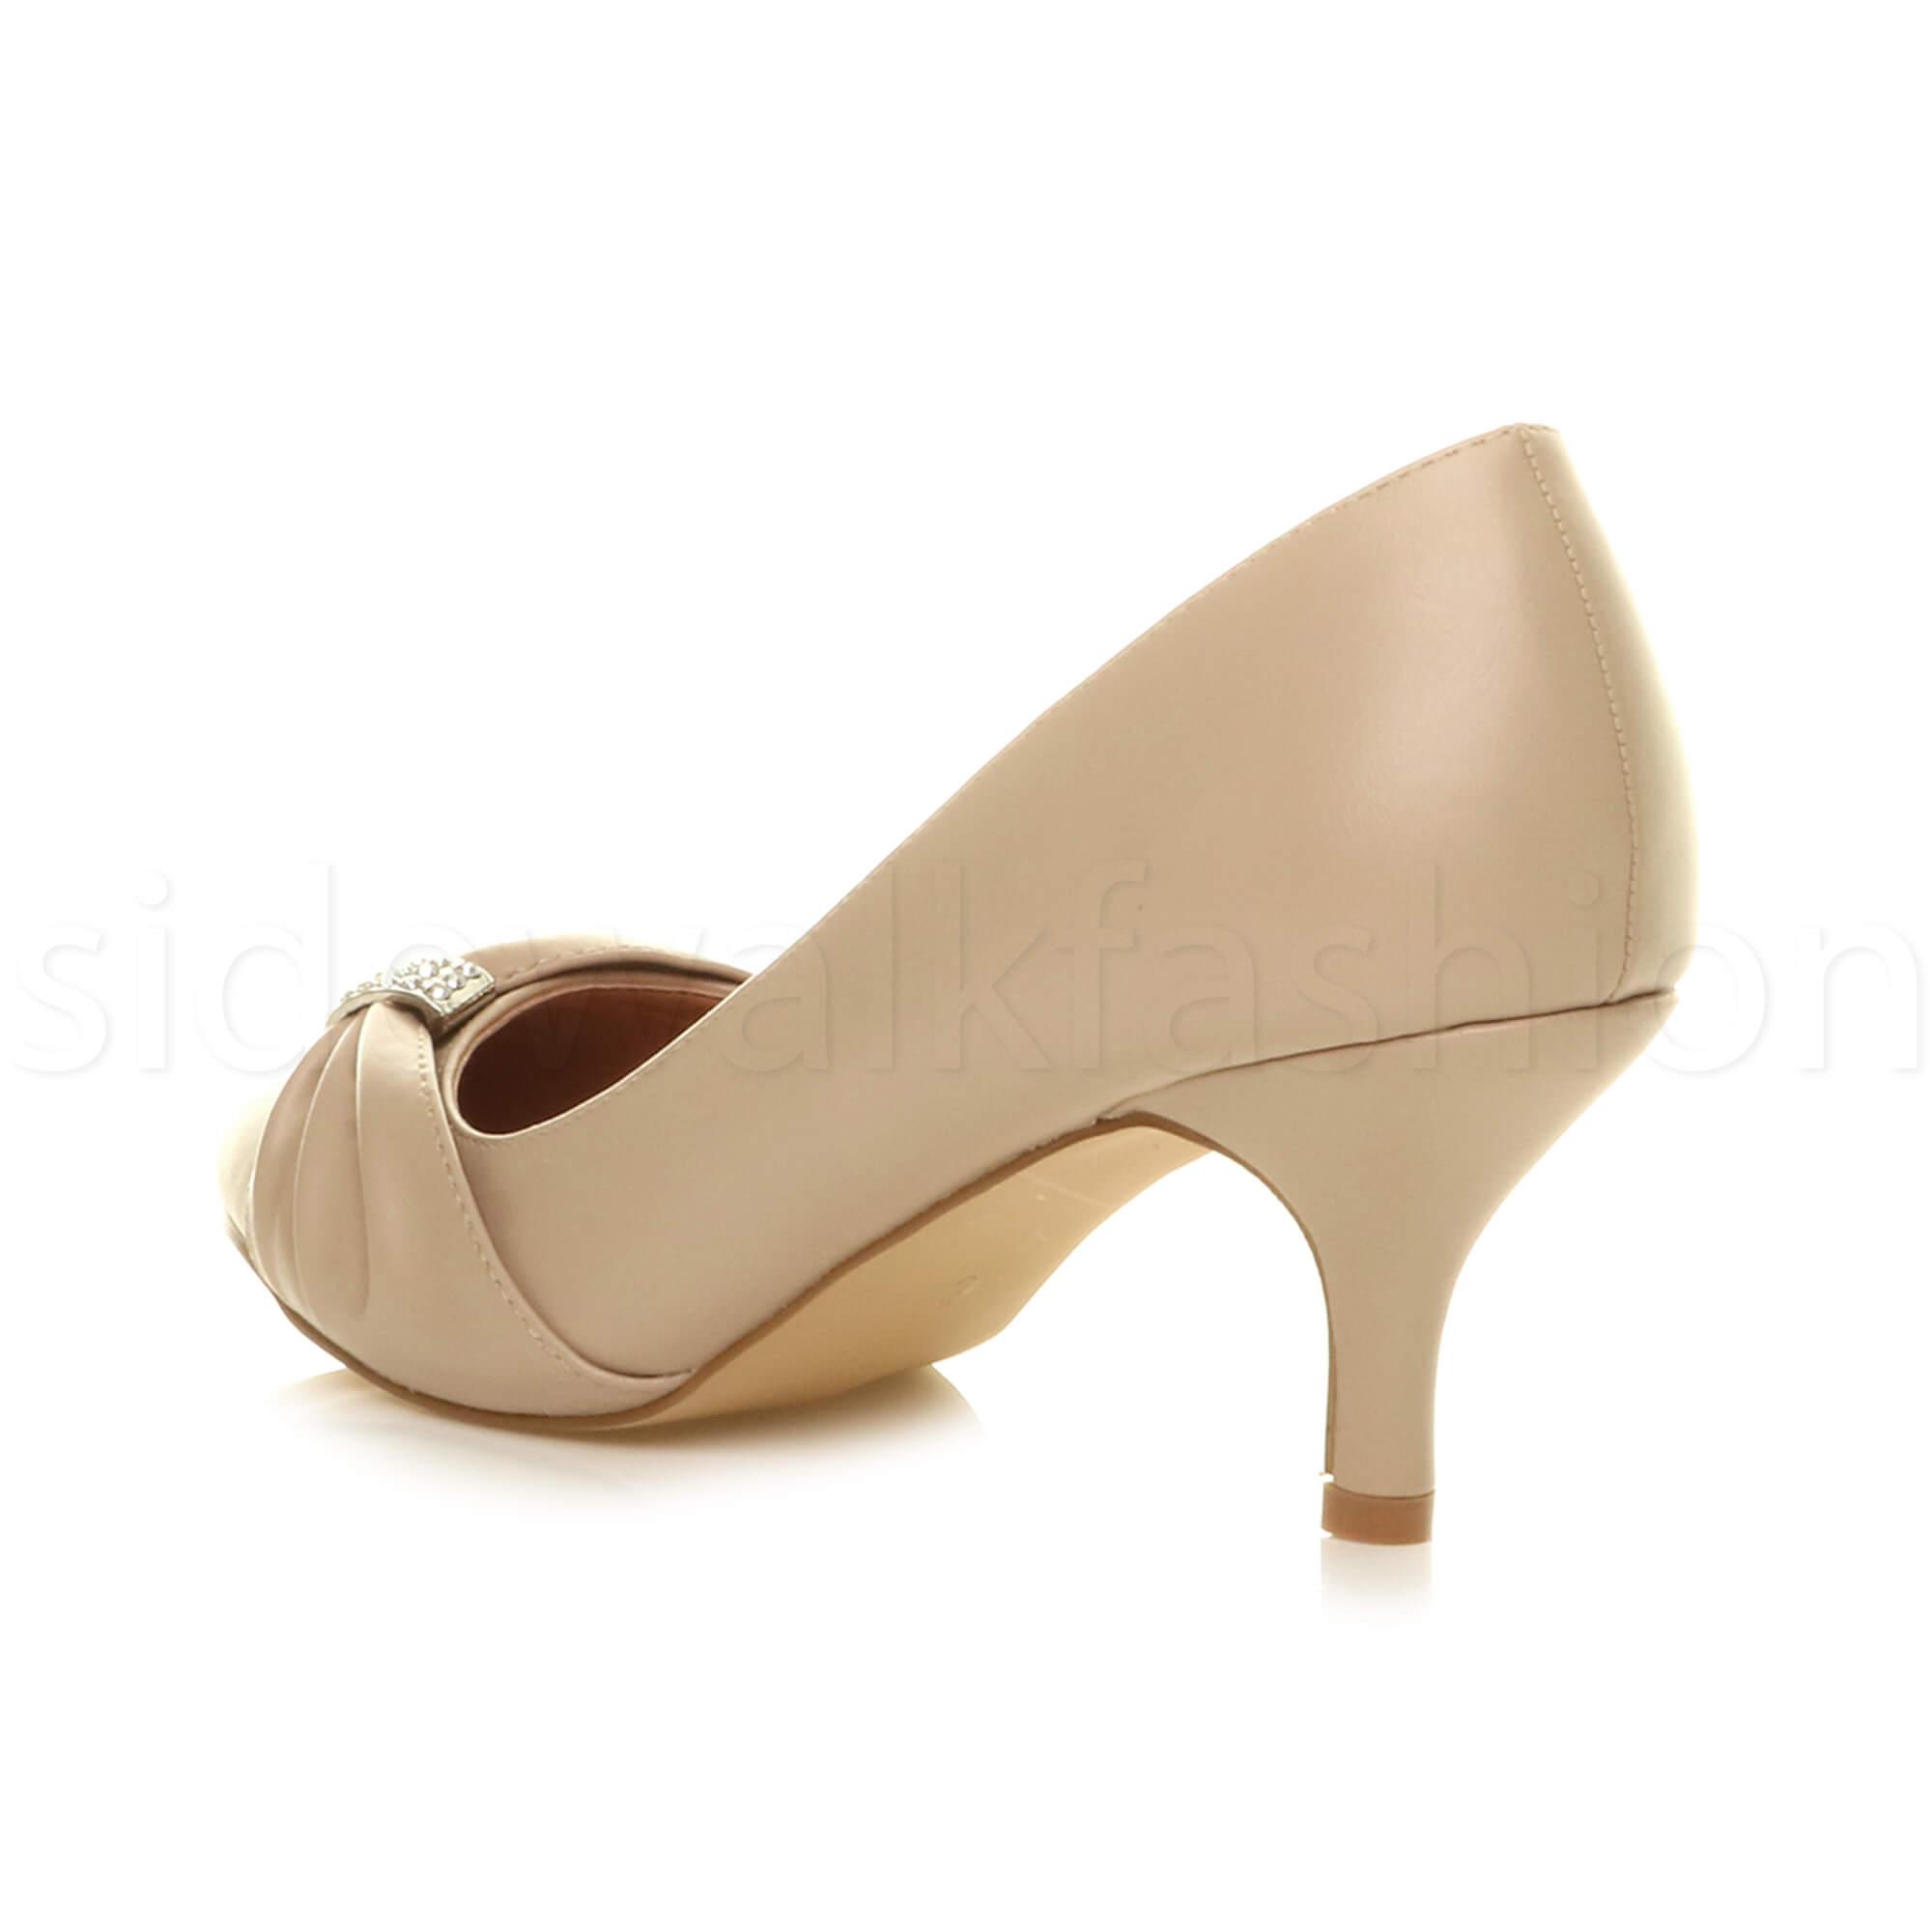 Womens-ladies-low-mid-heel-diamante-party-smart-evening-court-shoes-size thumbnail 61